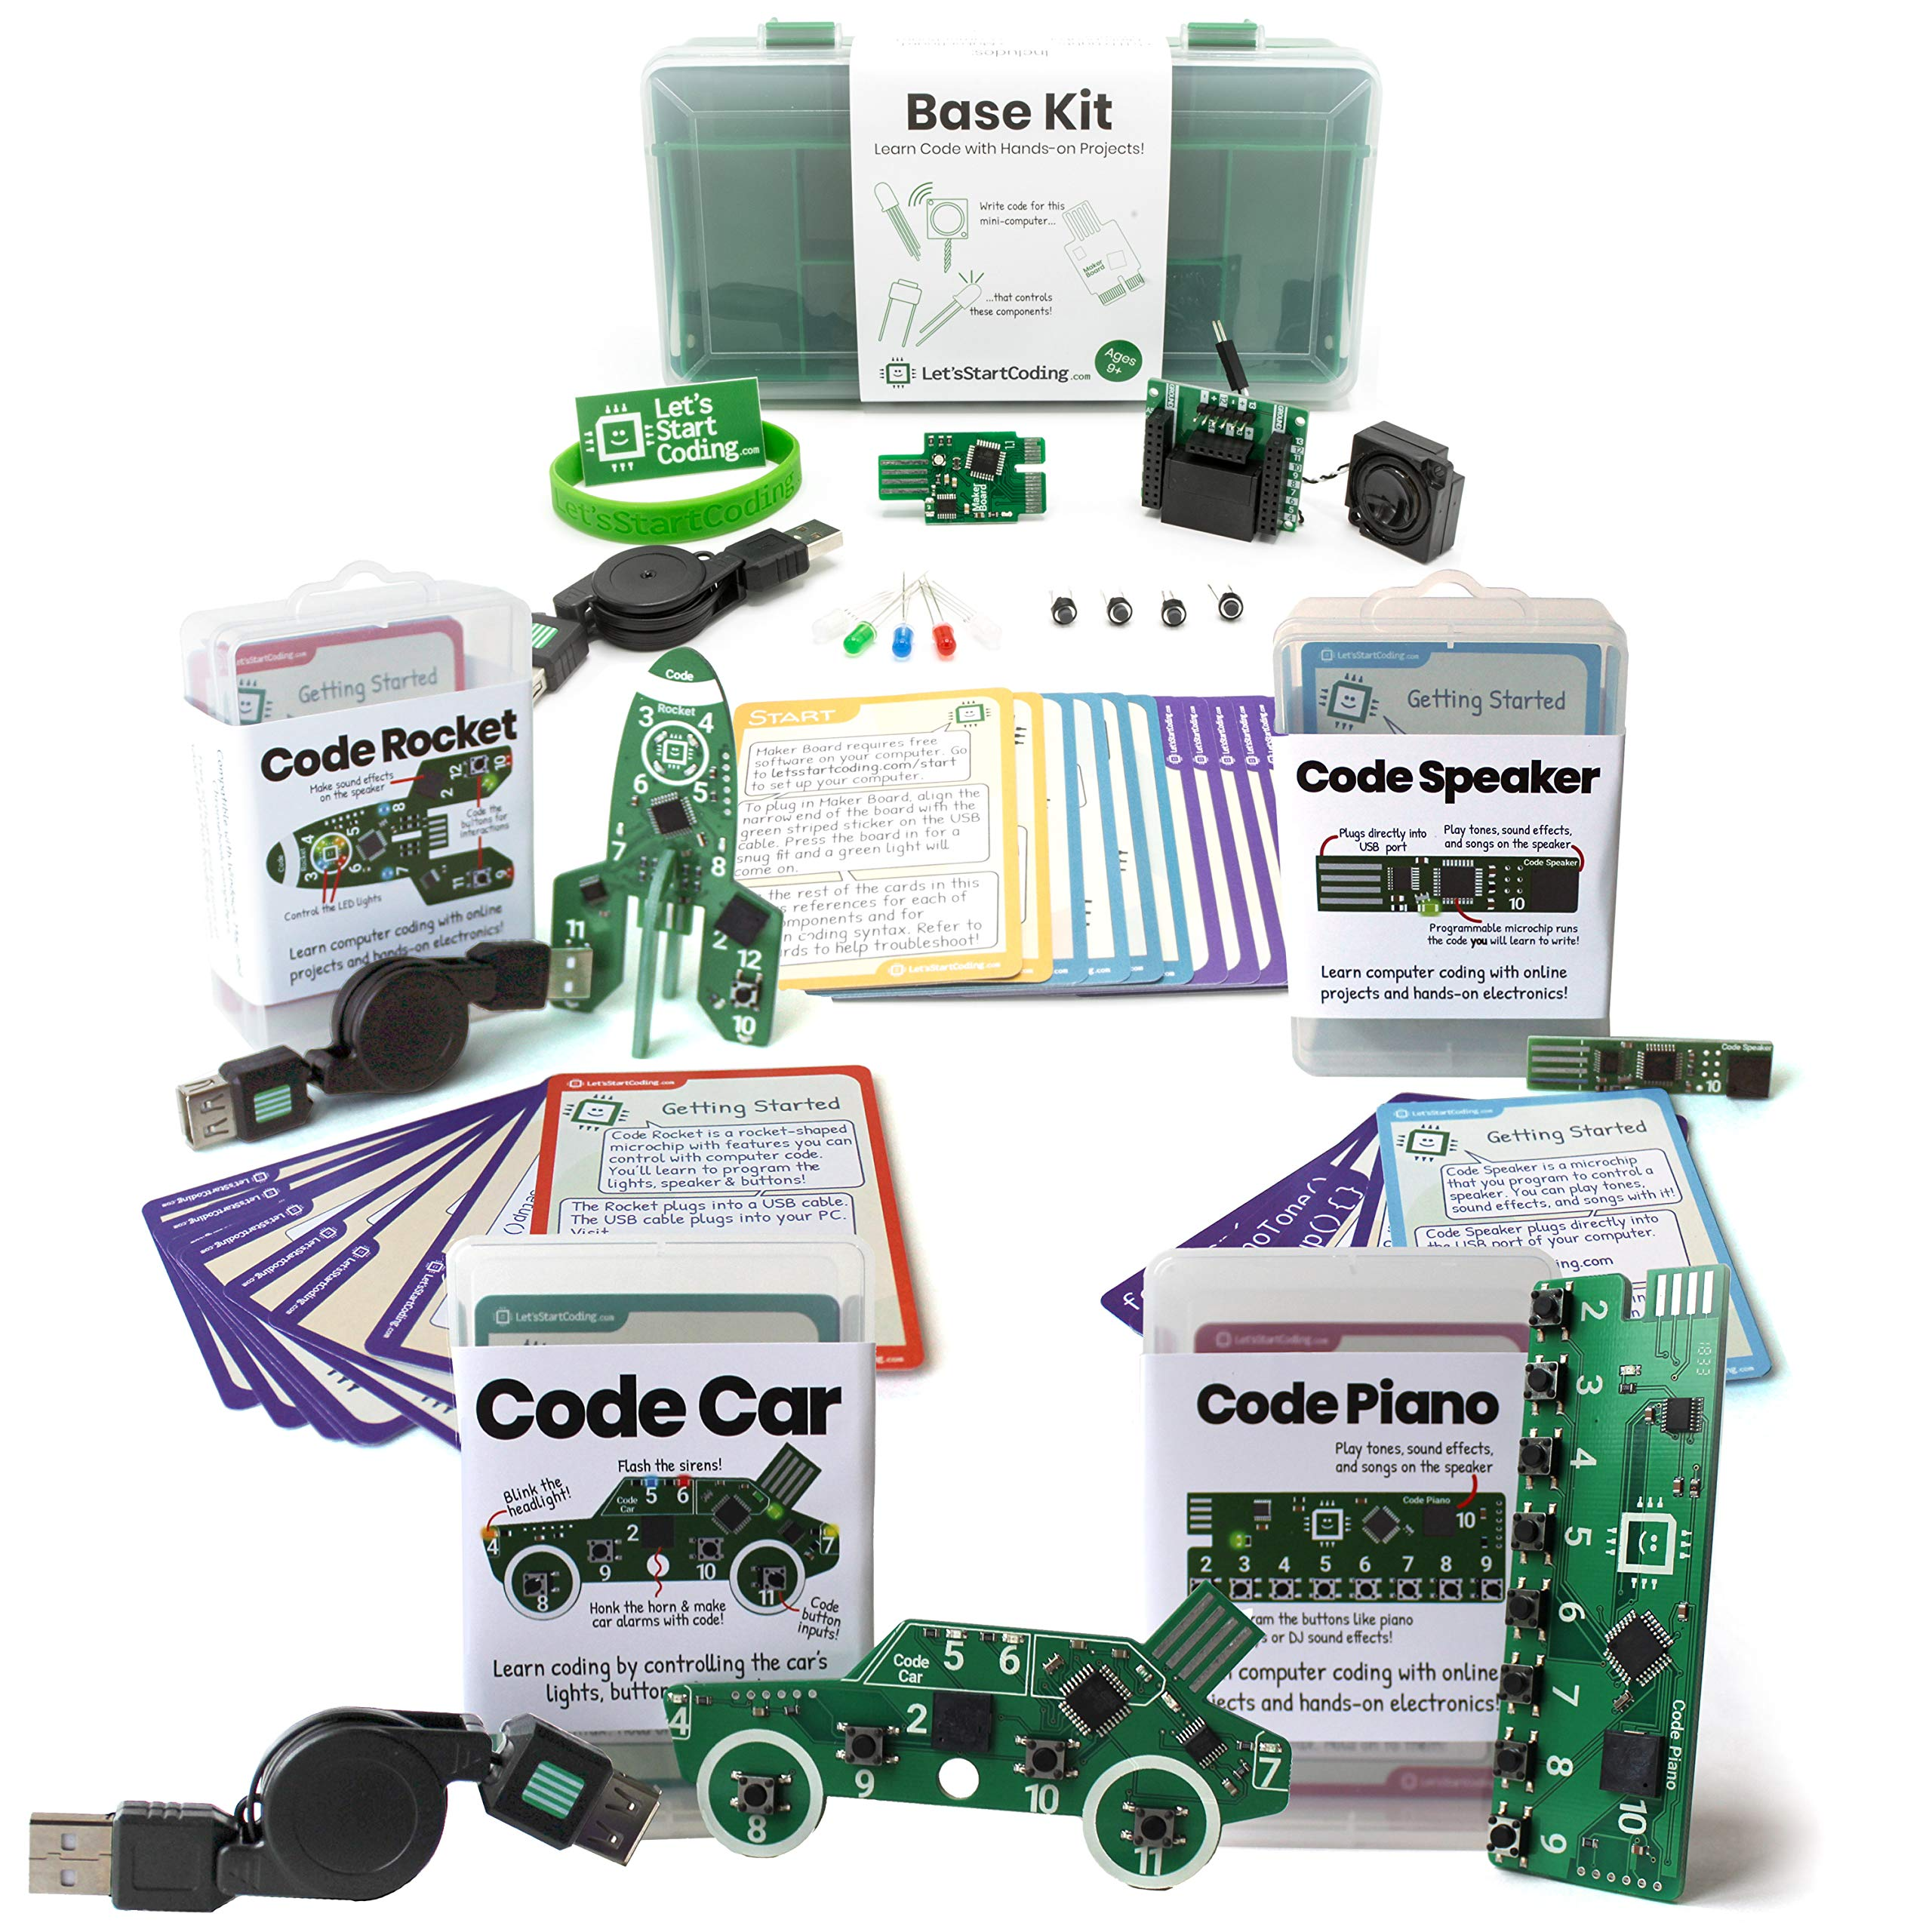 Bundle: Base Kit + Car + Rocket + Piano + Speaker | Coding Kits for Kids 8-12 | Bundle and Save!